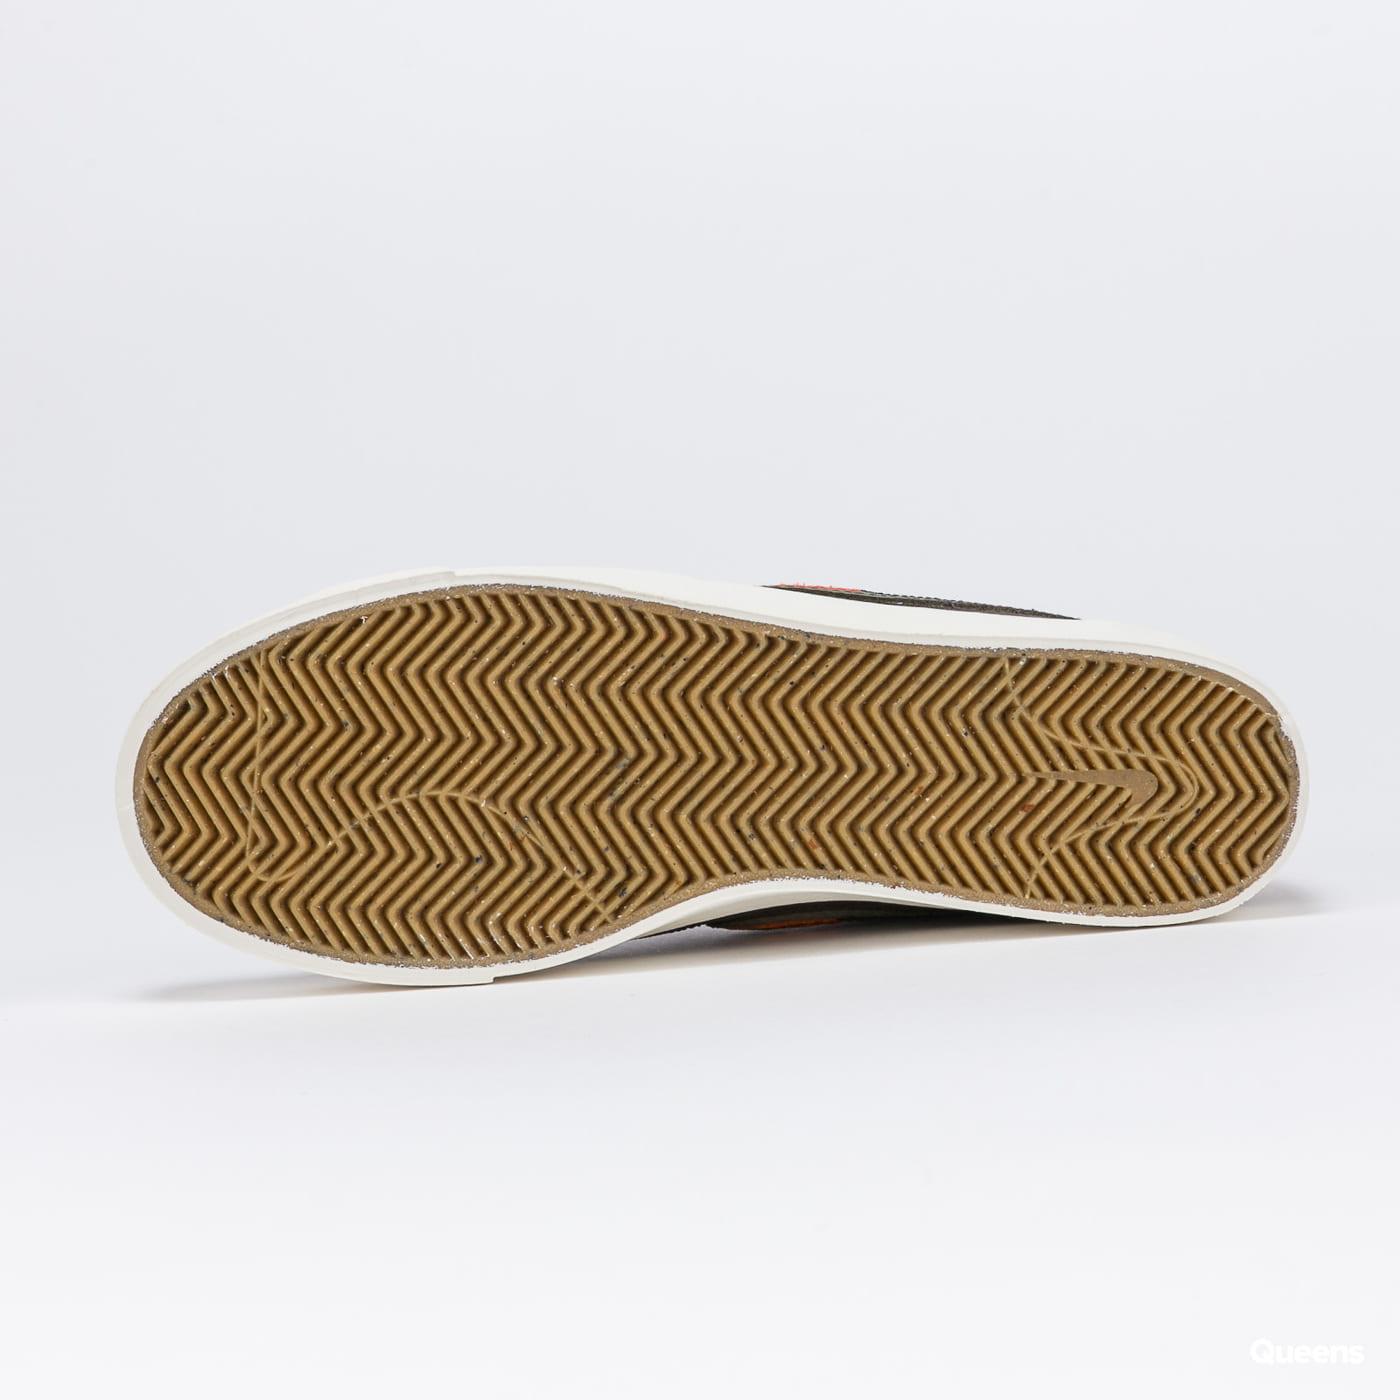 Nike SB Blazer Court DVDL baroque brown / medium olive